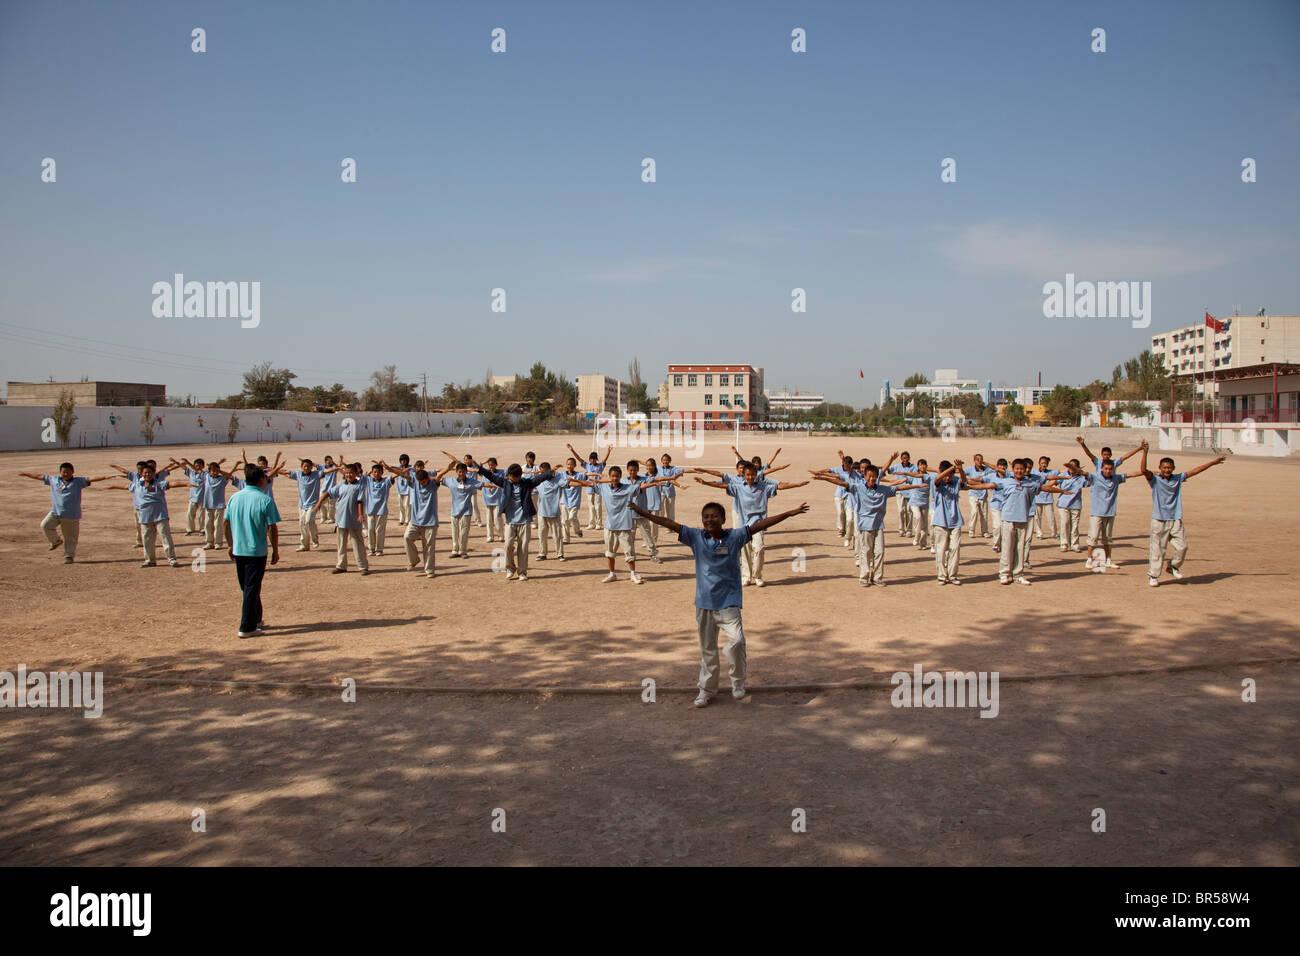 School Yard exercises in Turpan Xinjiang China. - Stock Image